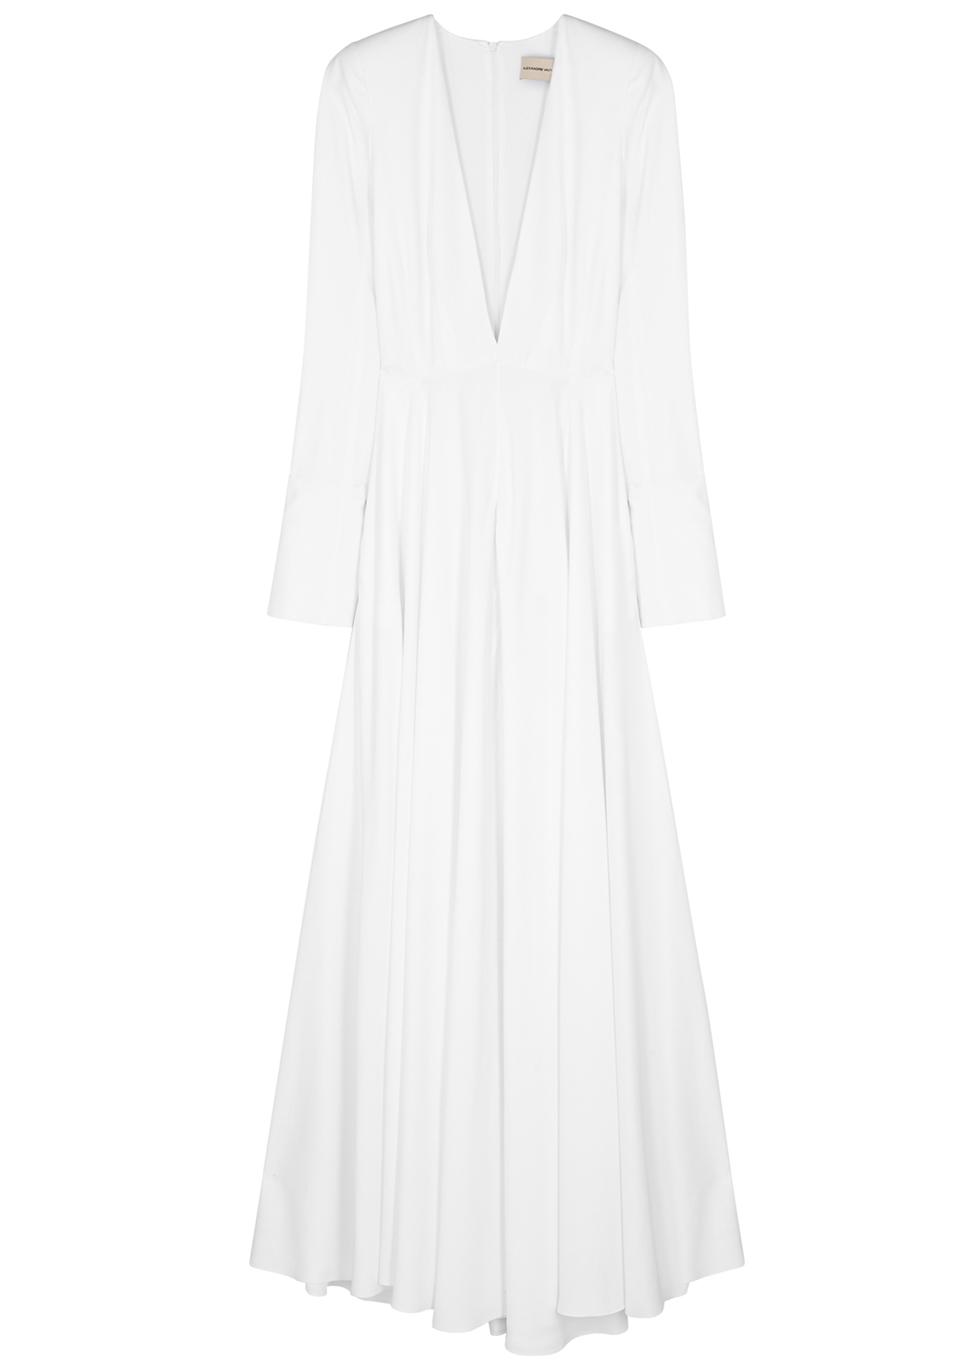 33b4cd3d27ce Designer Dresses   Designer Gowns - Harvey Nichols